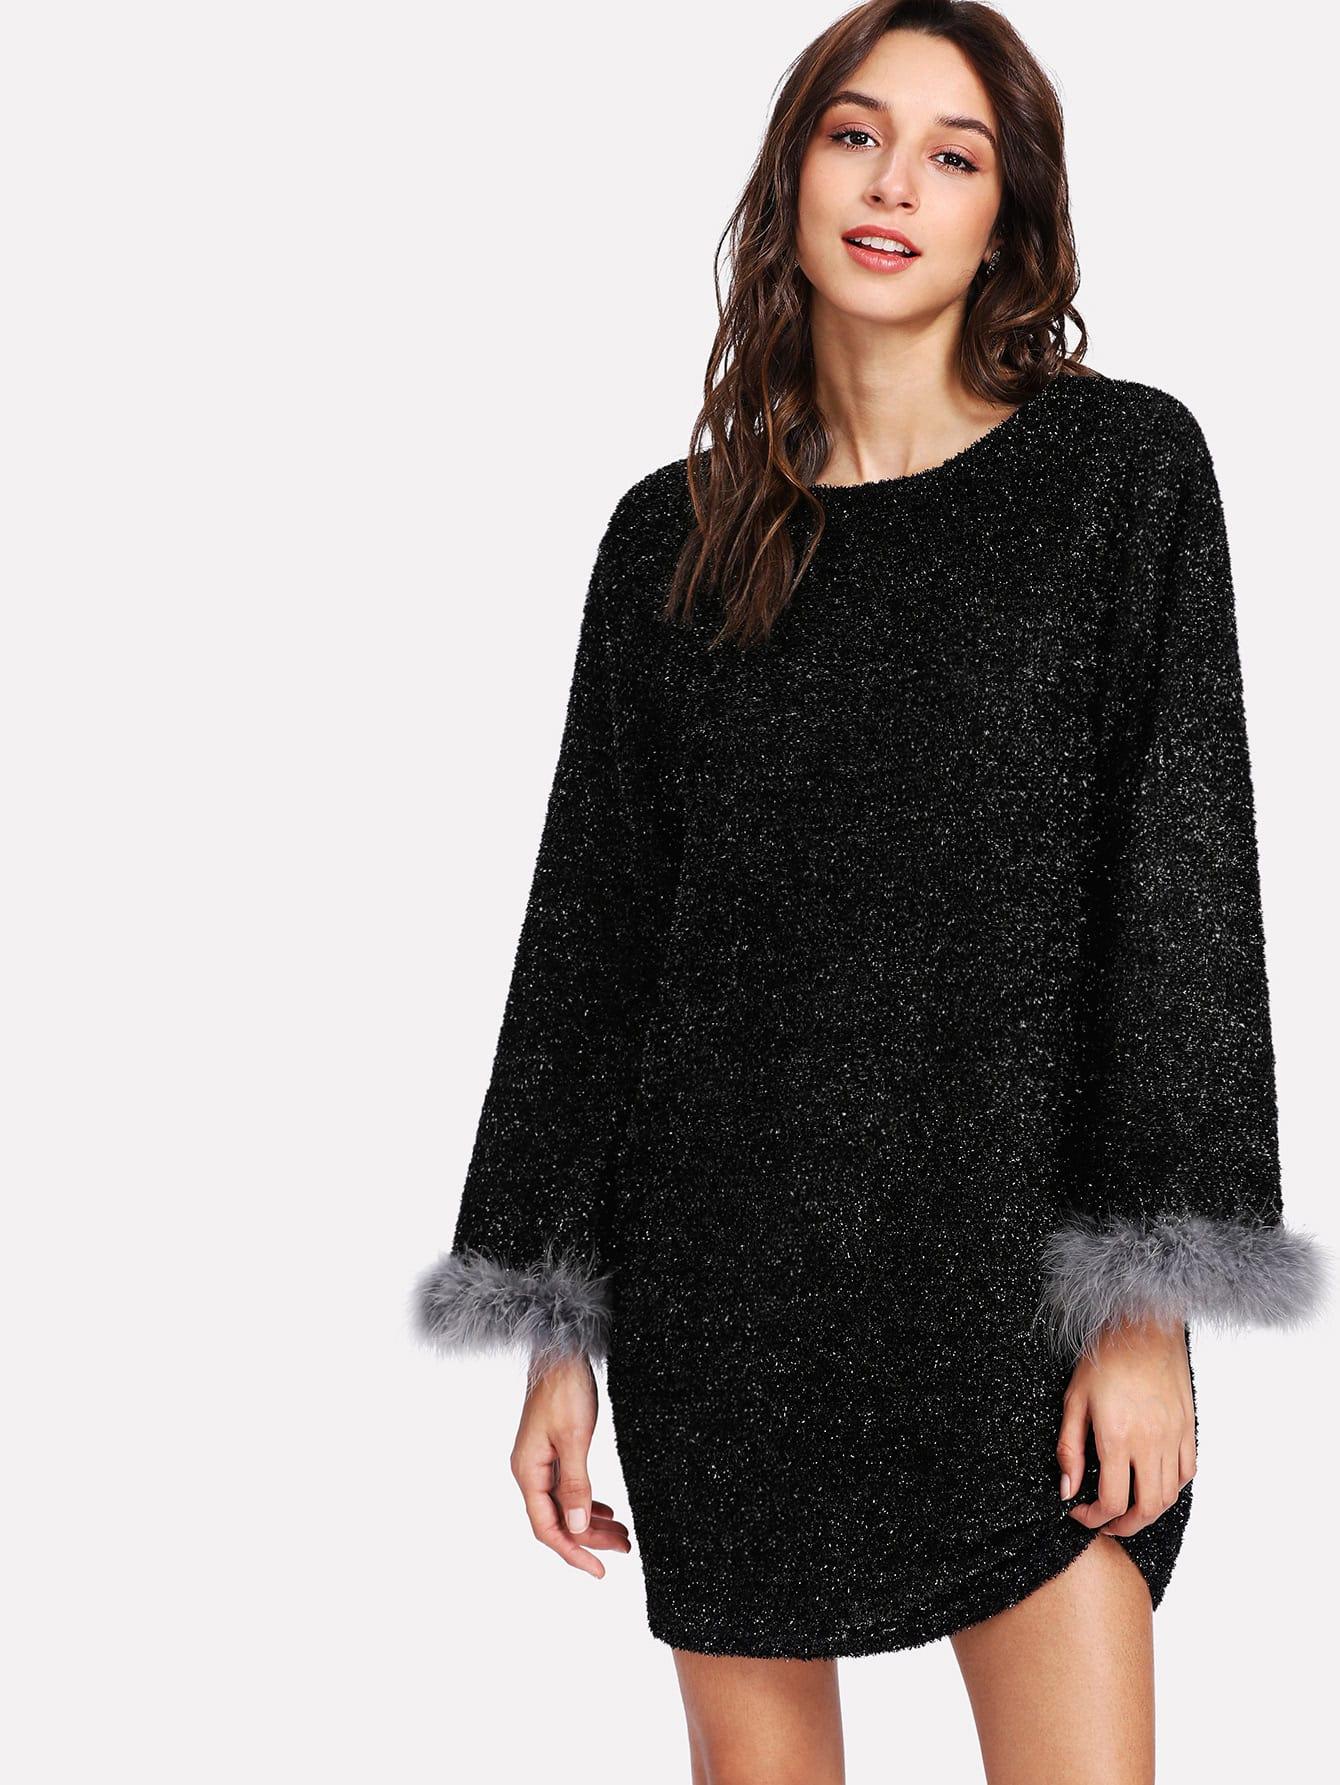 Contrast Faux Fur Cuff Dress contrast faux fur cuff pullover